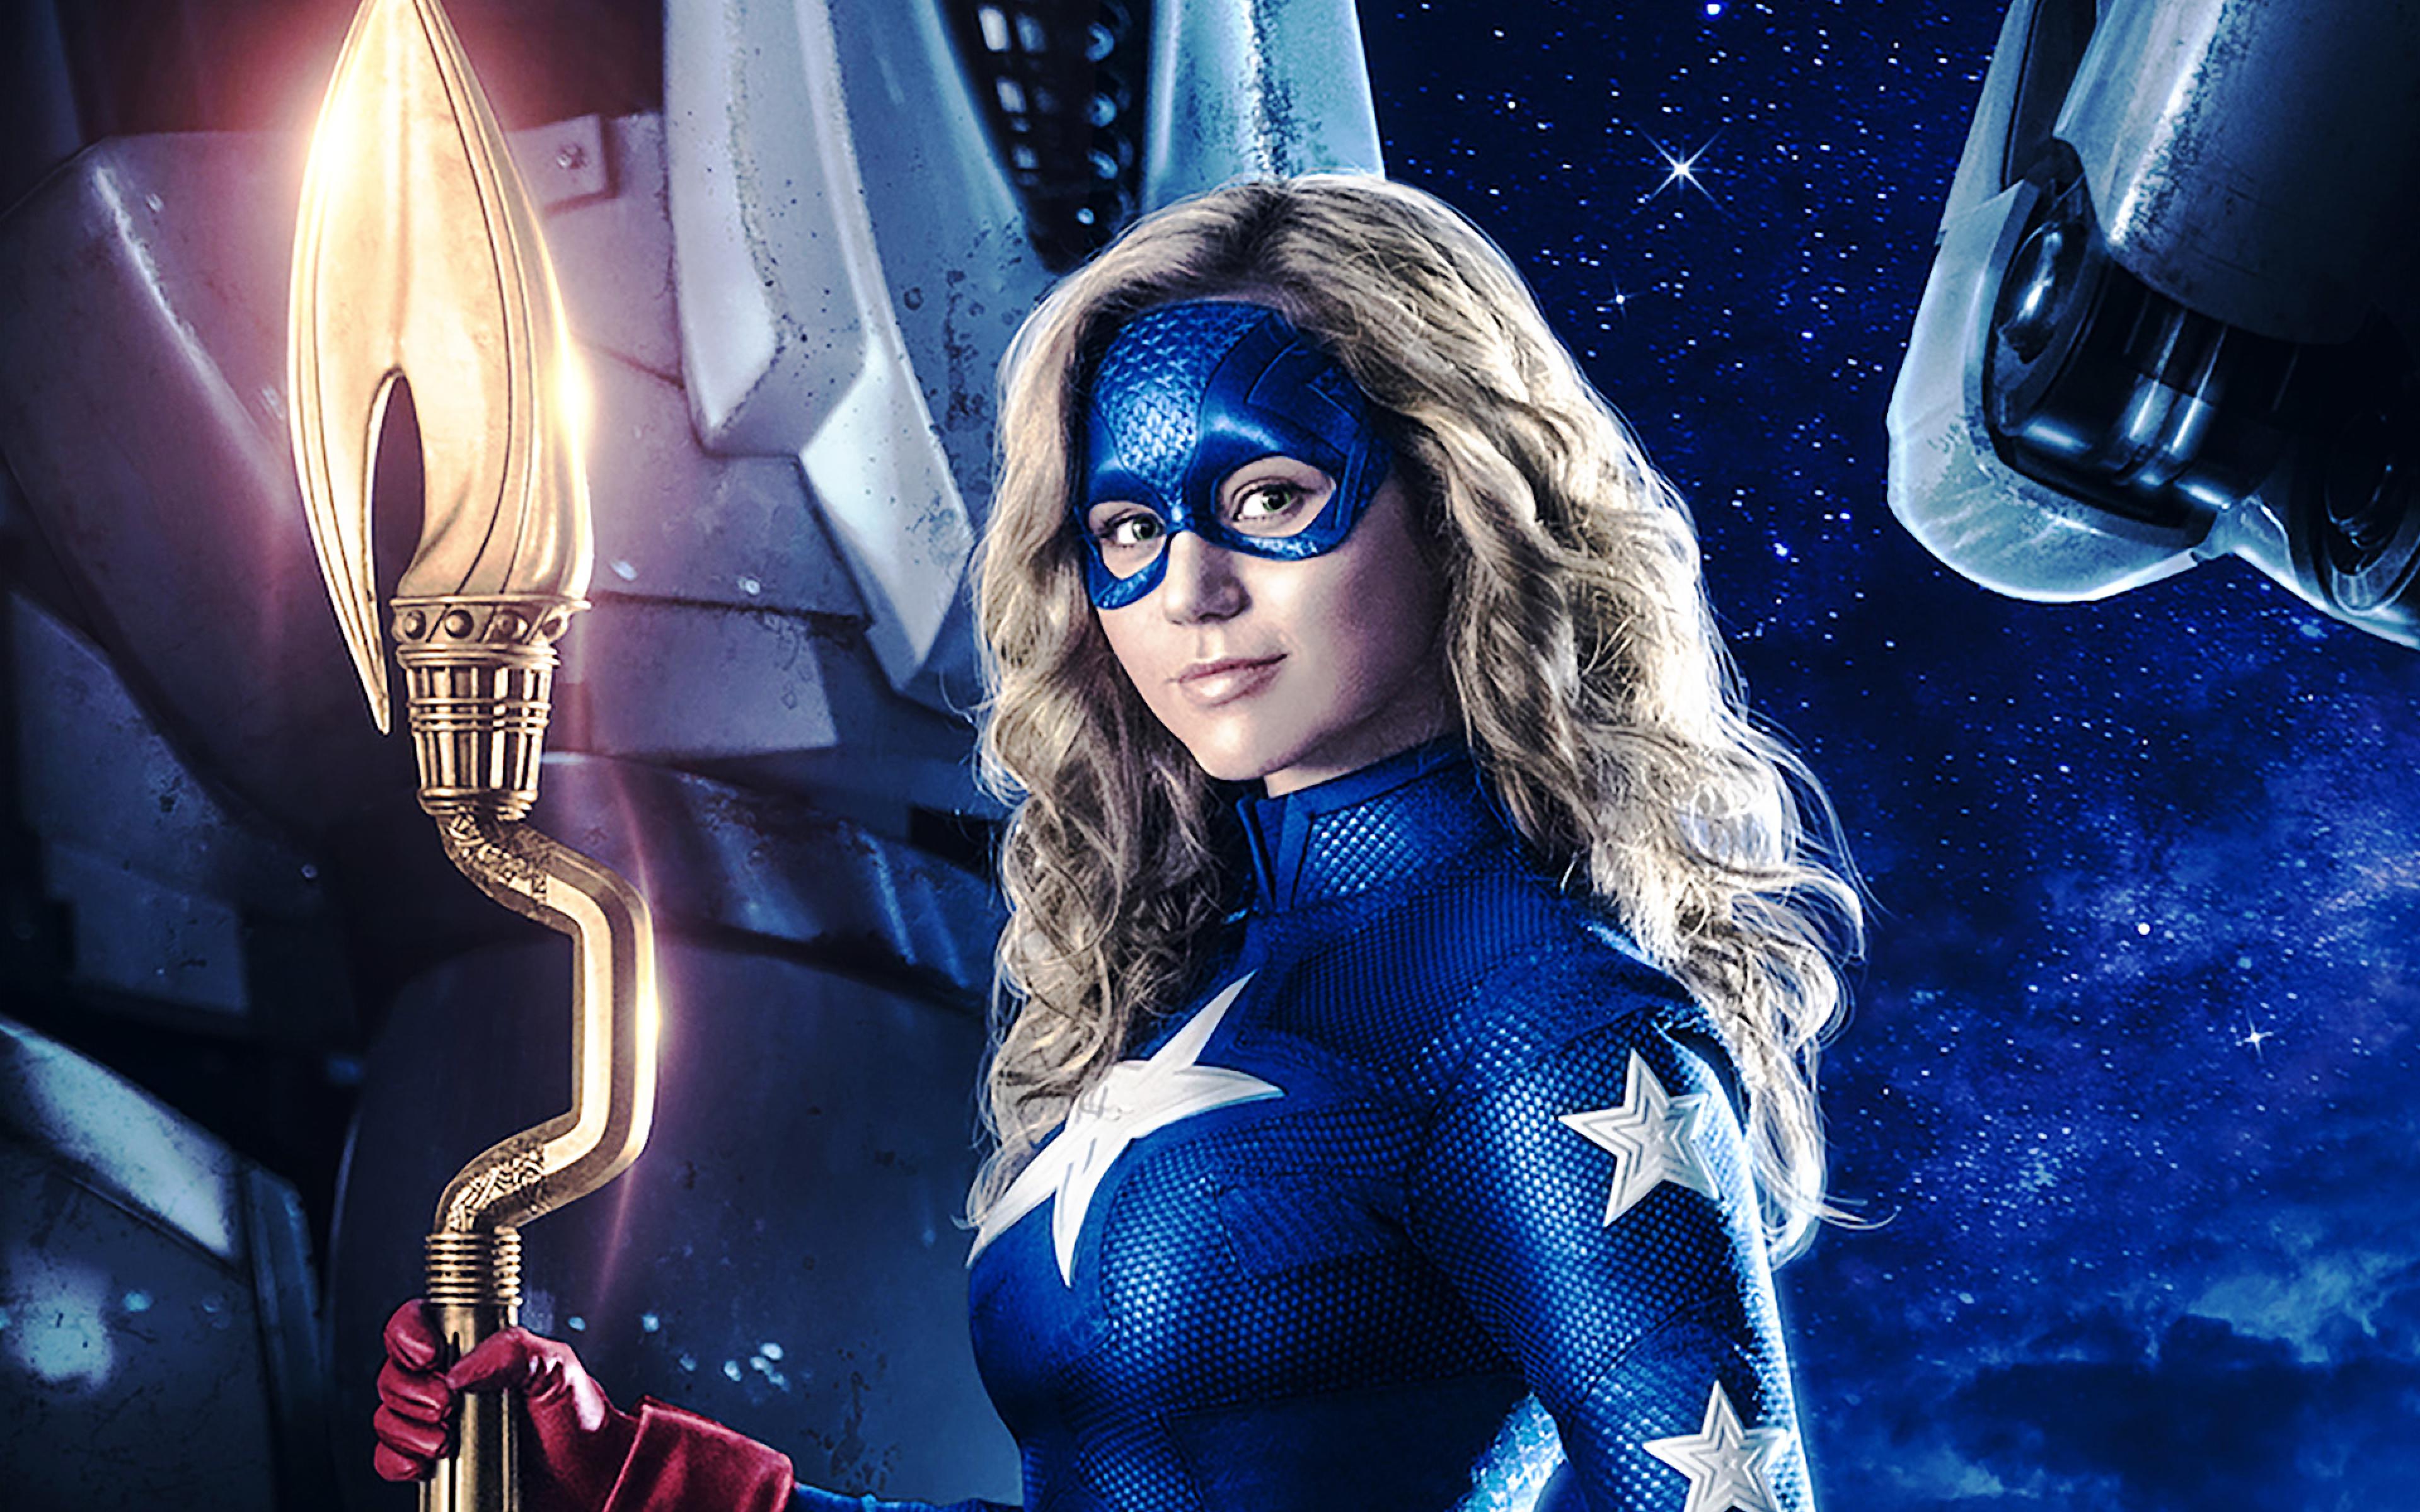 3840x2400 Stargirl DC Universe 4K 3840x2400 Resolution Wallpaper 3840x2400